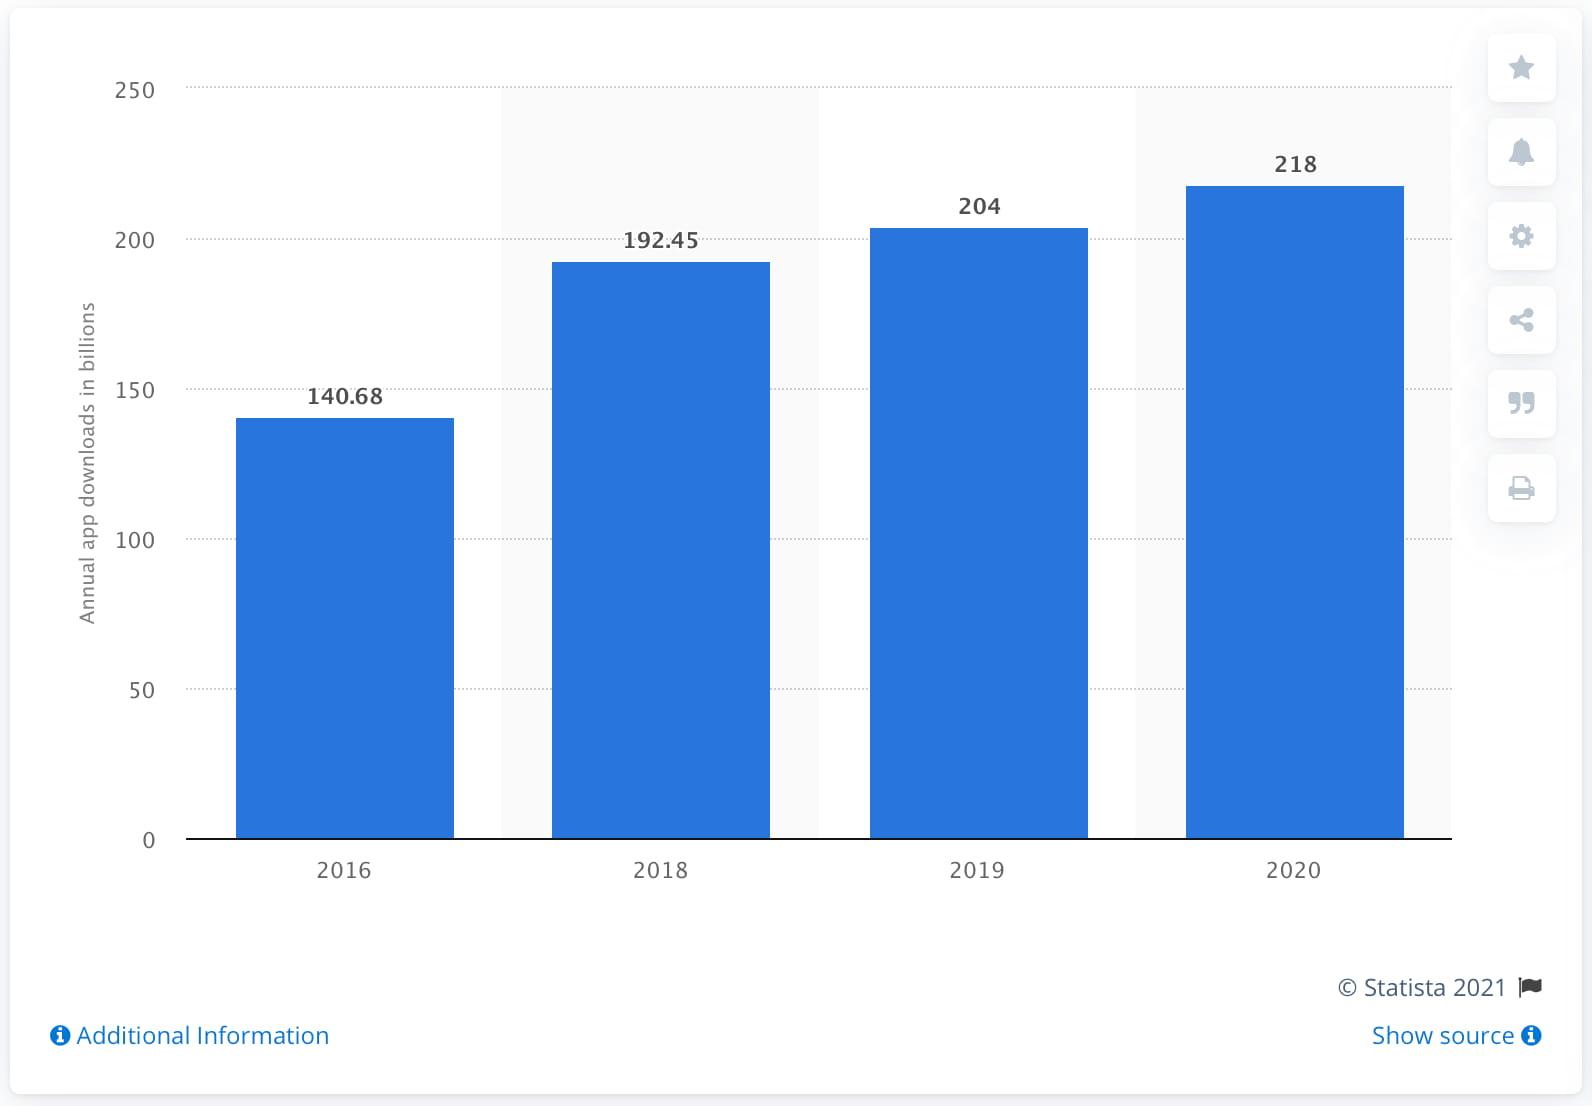 Annual app downloads in billions